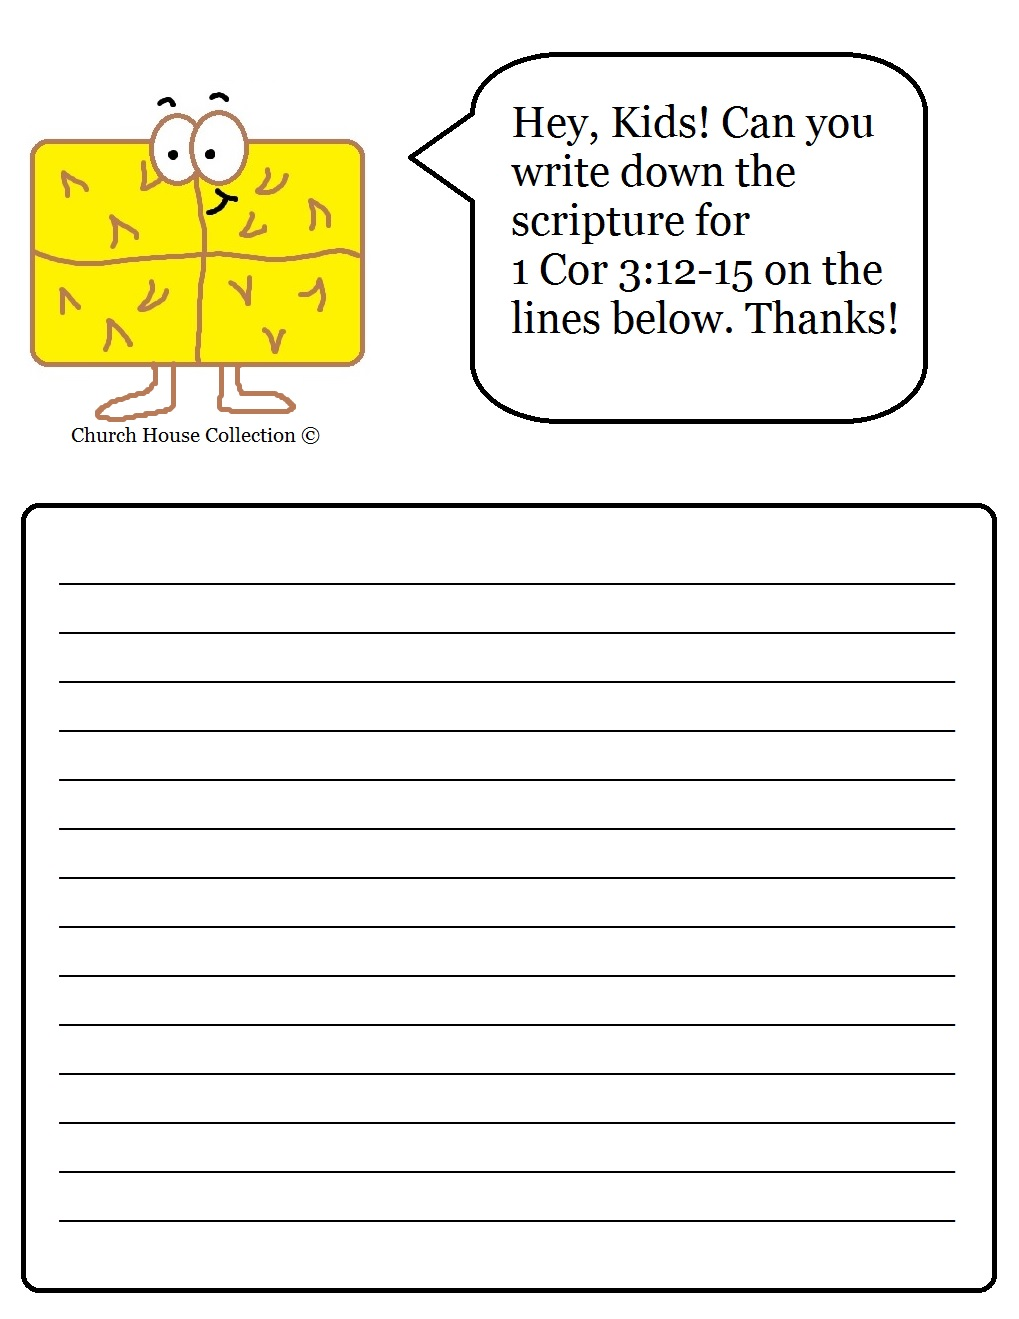 Printables Sunday School Printable Worksheets sunday school worksheets templates and free lessons printables games s